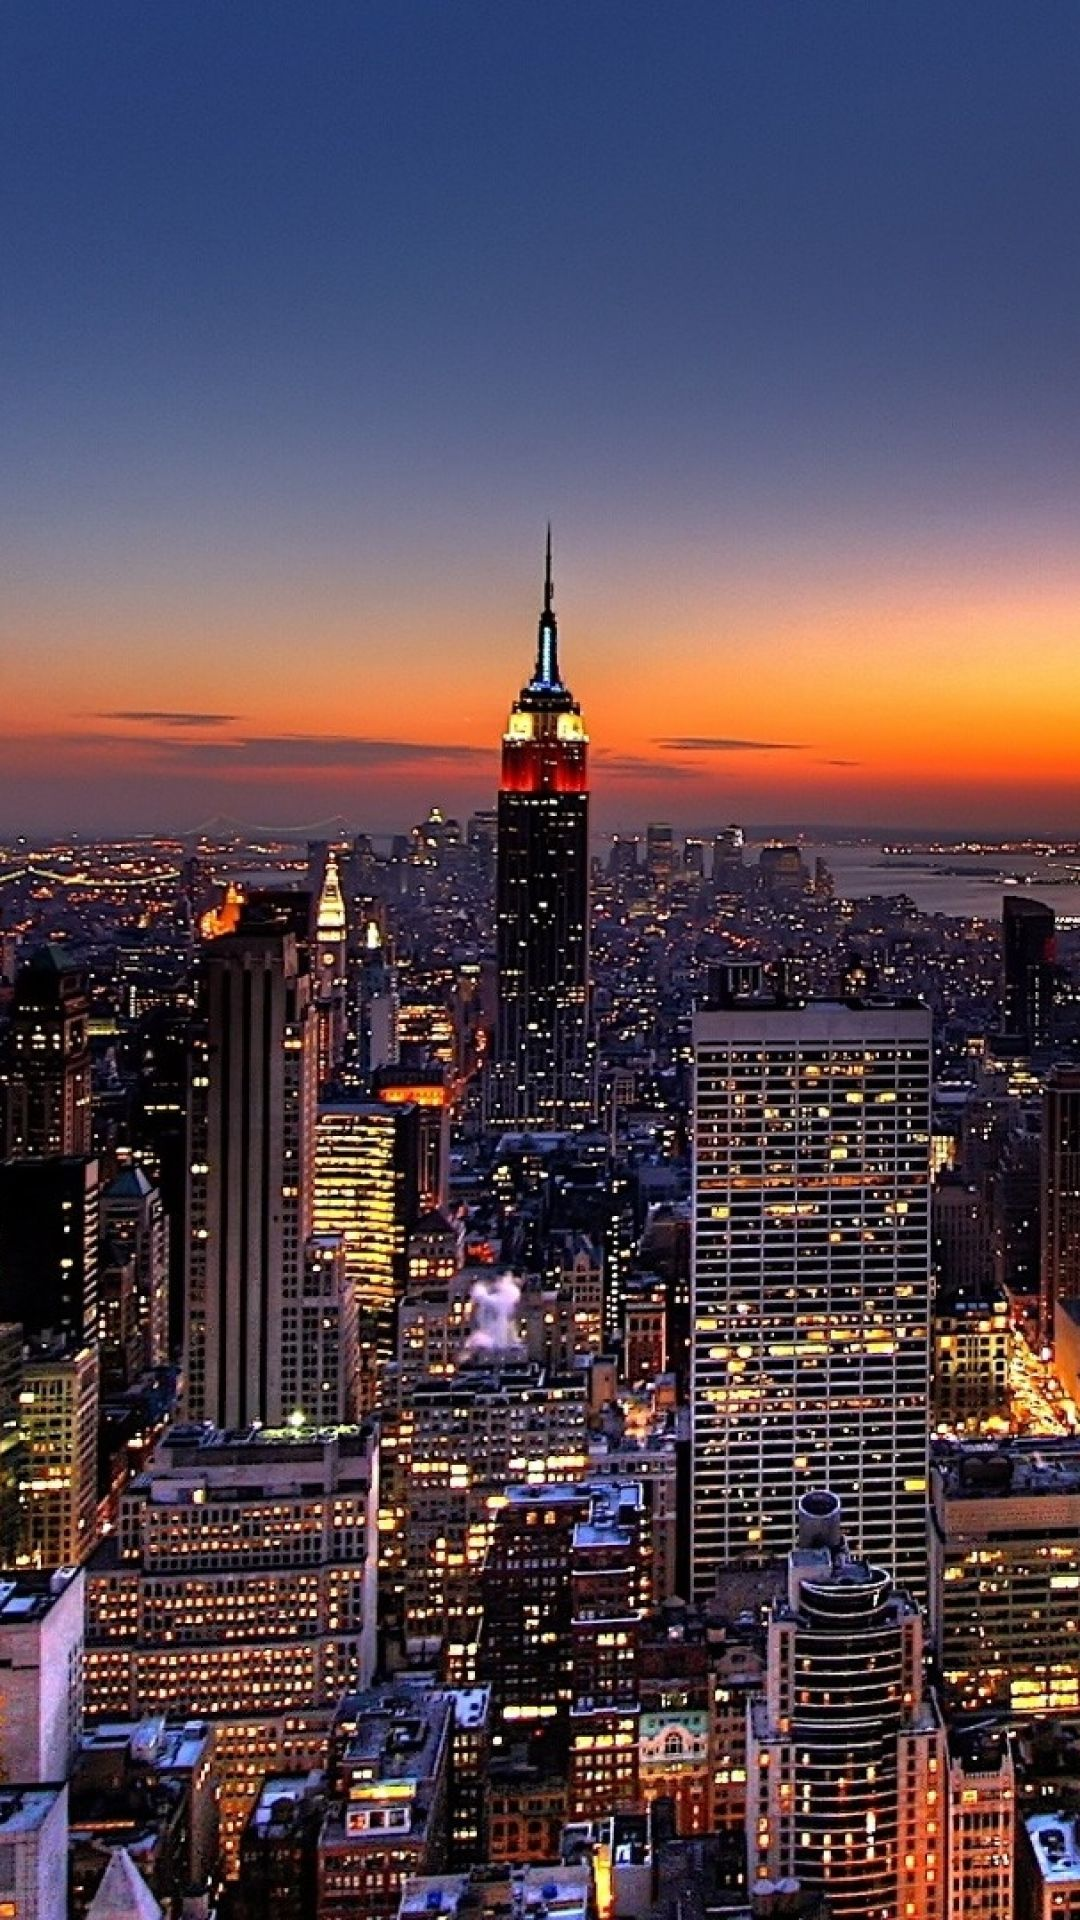 27 New York City Wallpaper At Night On Wallpapersafari